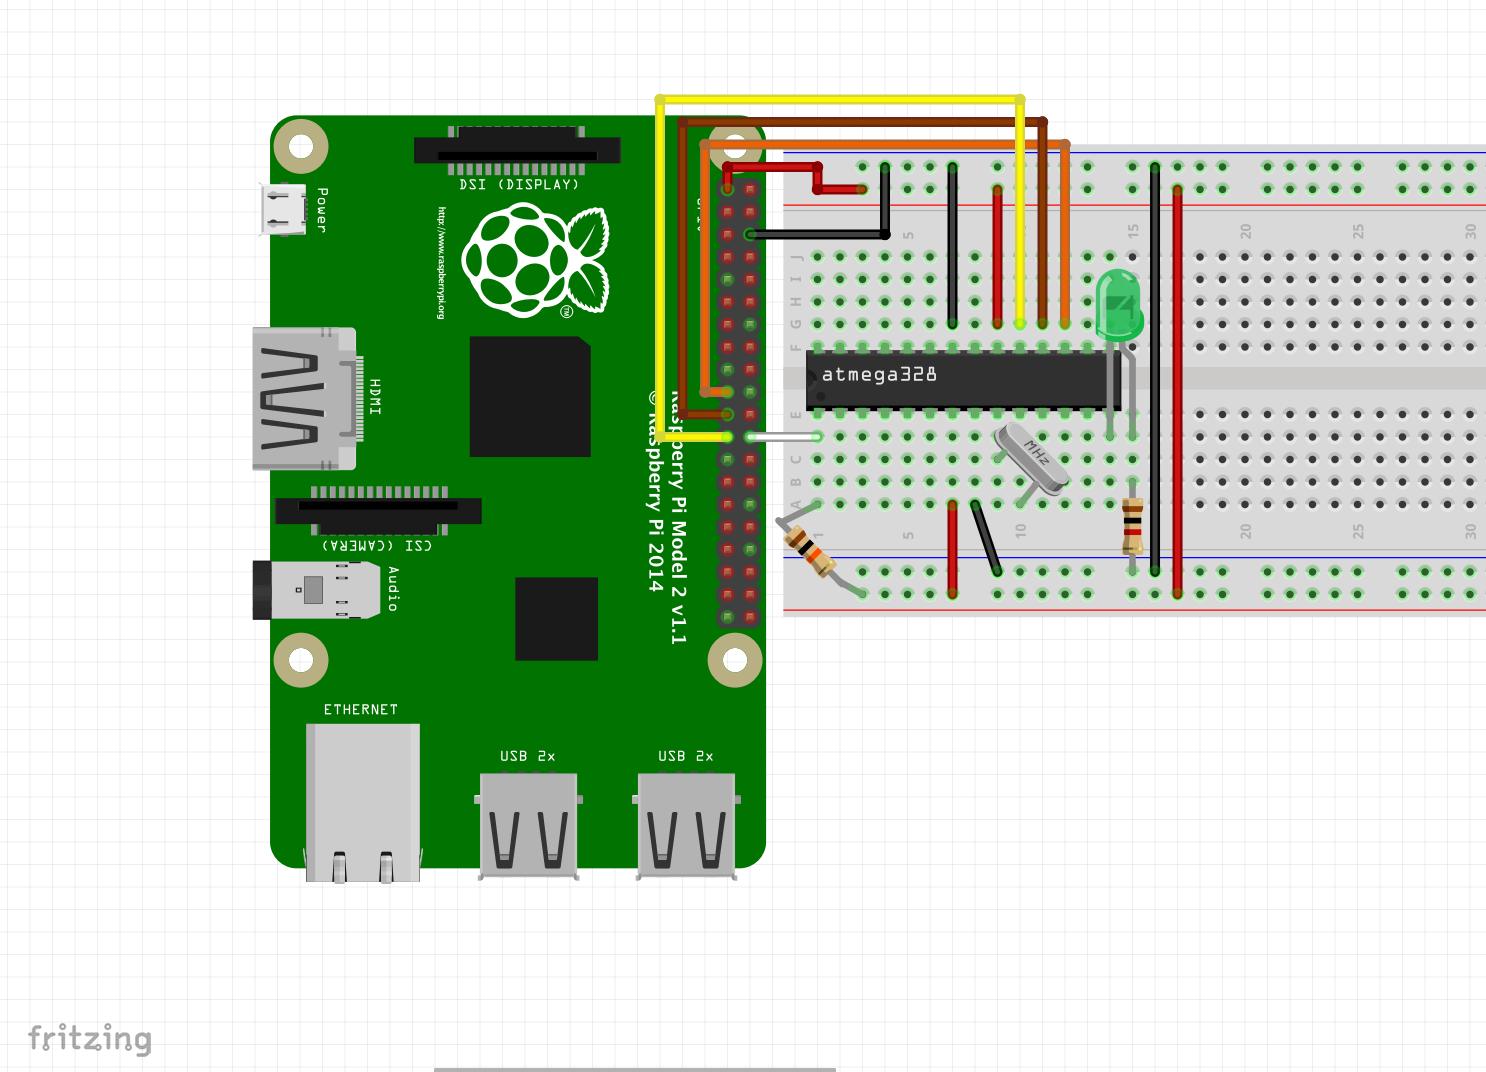 Connecting an ATMEGA328P to a Raspberry Pi